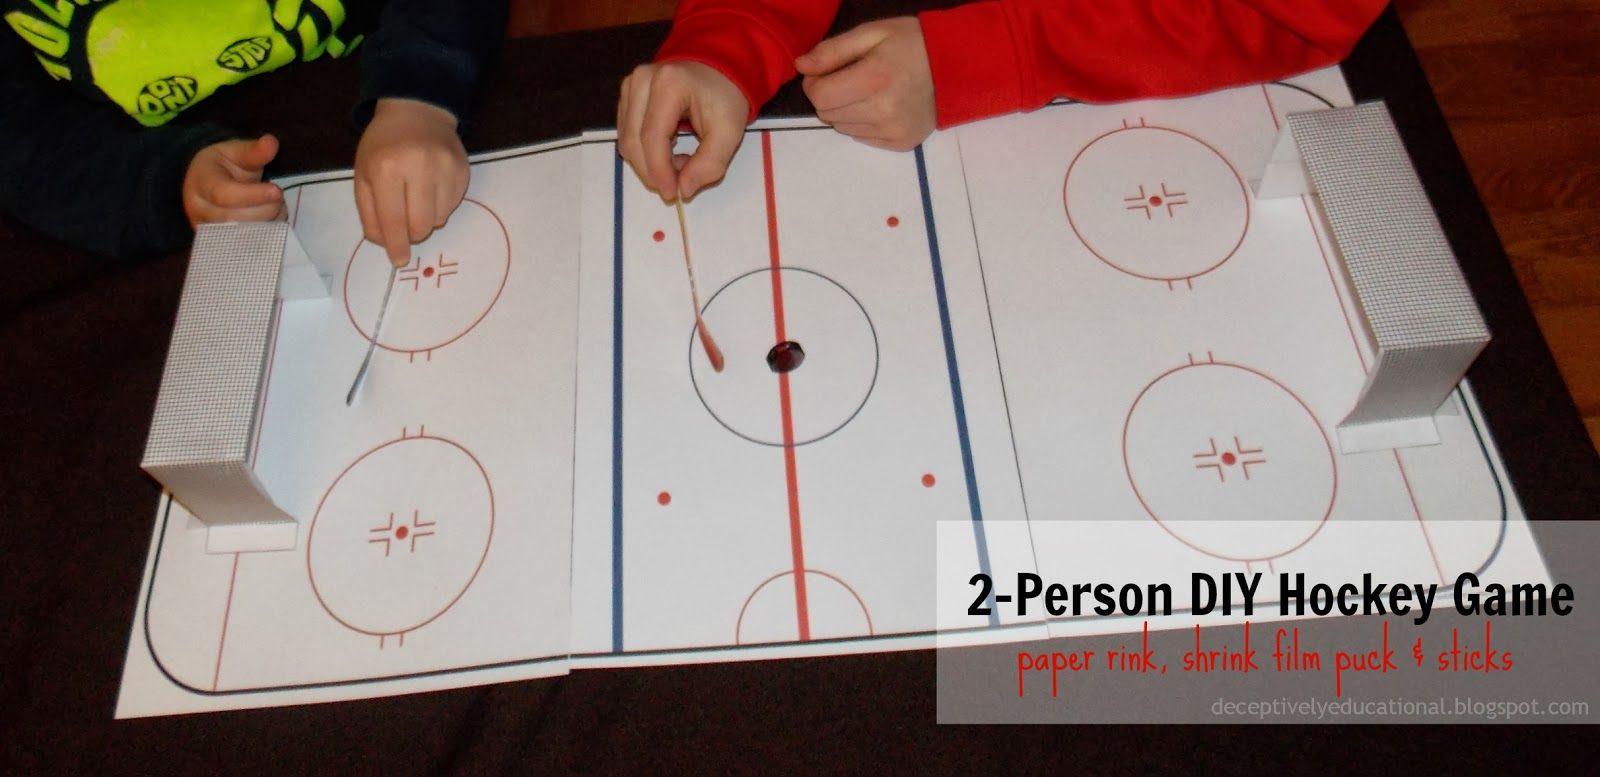 Diy Mini Hockey Game Relentlessly Fun Deceptively Educational